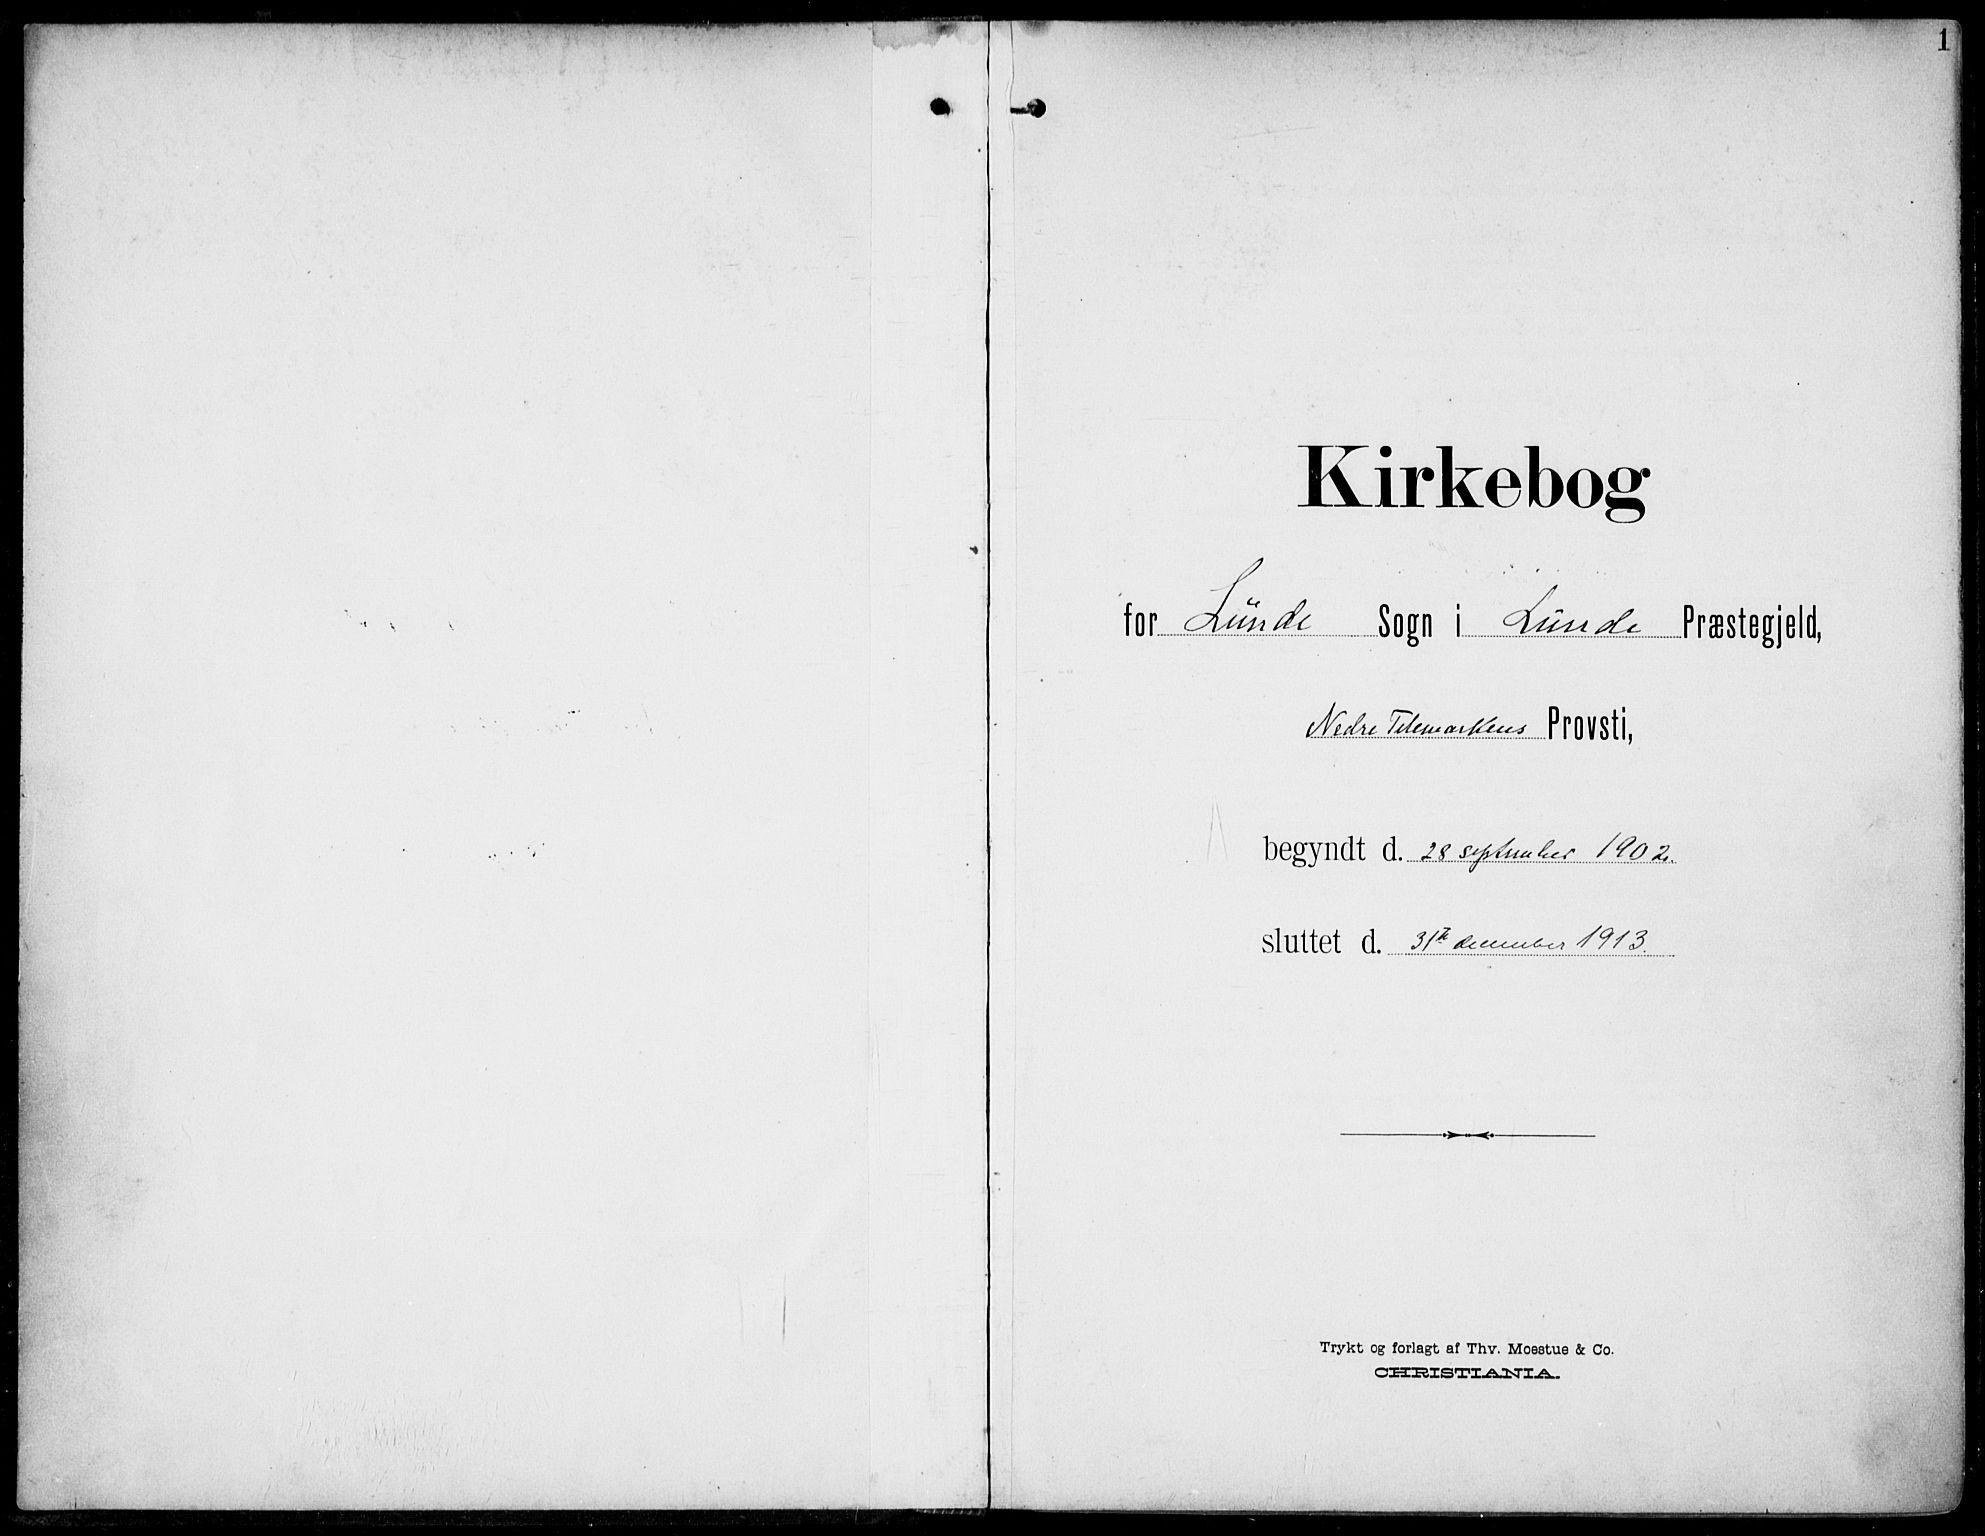 SAKO, Lunde kirkebøker, F/Fa/L0004: Ministerialbok nr. I 4, 1902-1913, s. 1